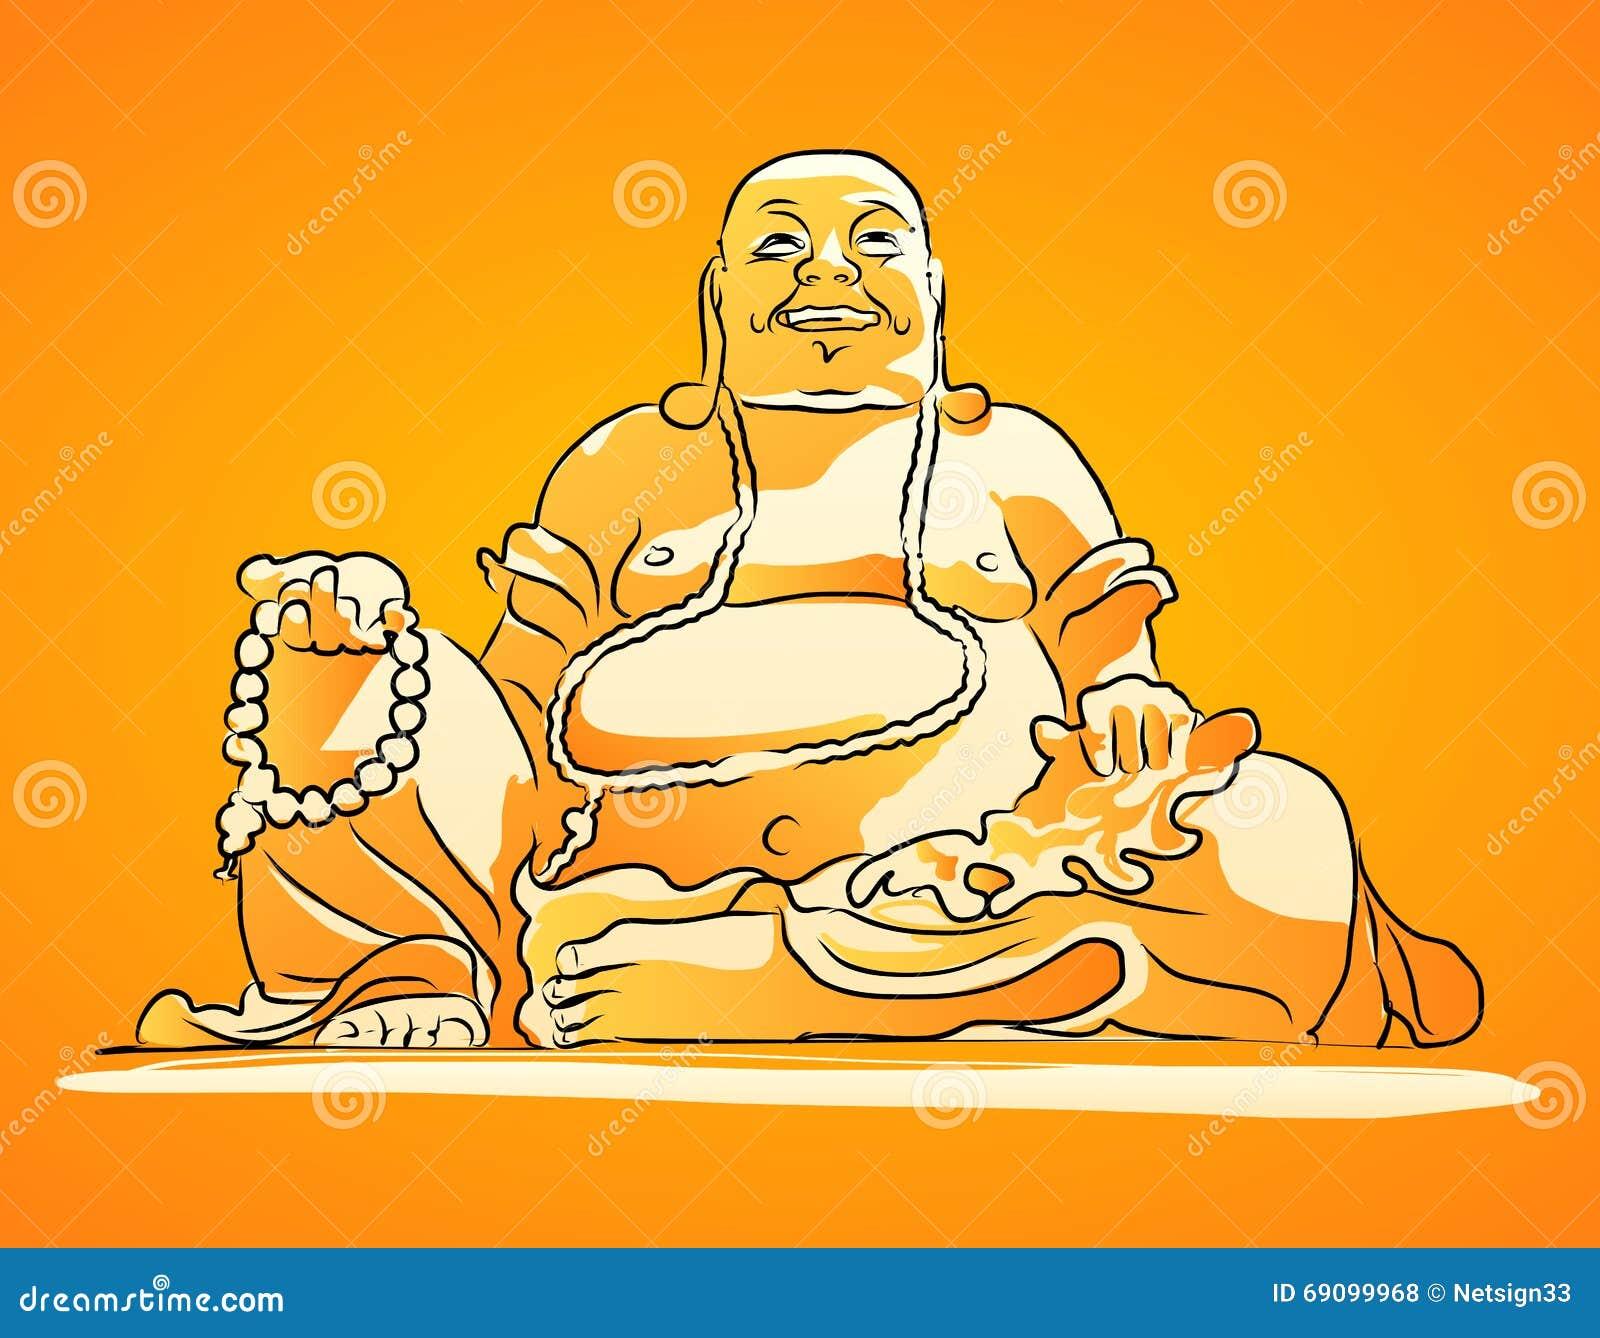 dessin de vecteur ombrag par orange de maitreya bouddha photos libres de droits